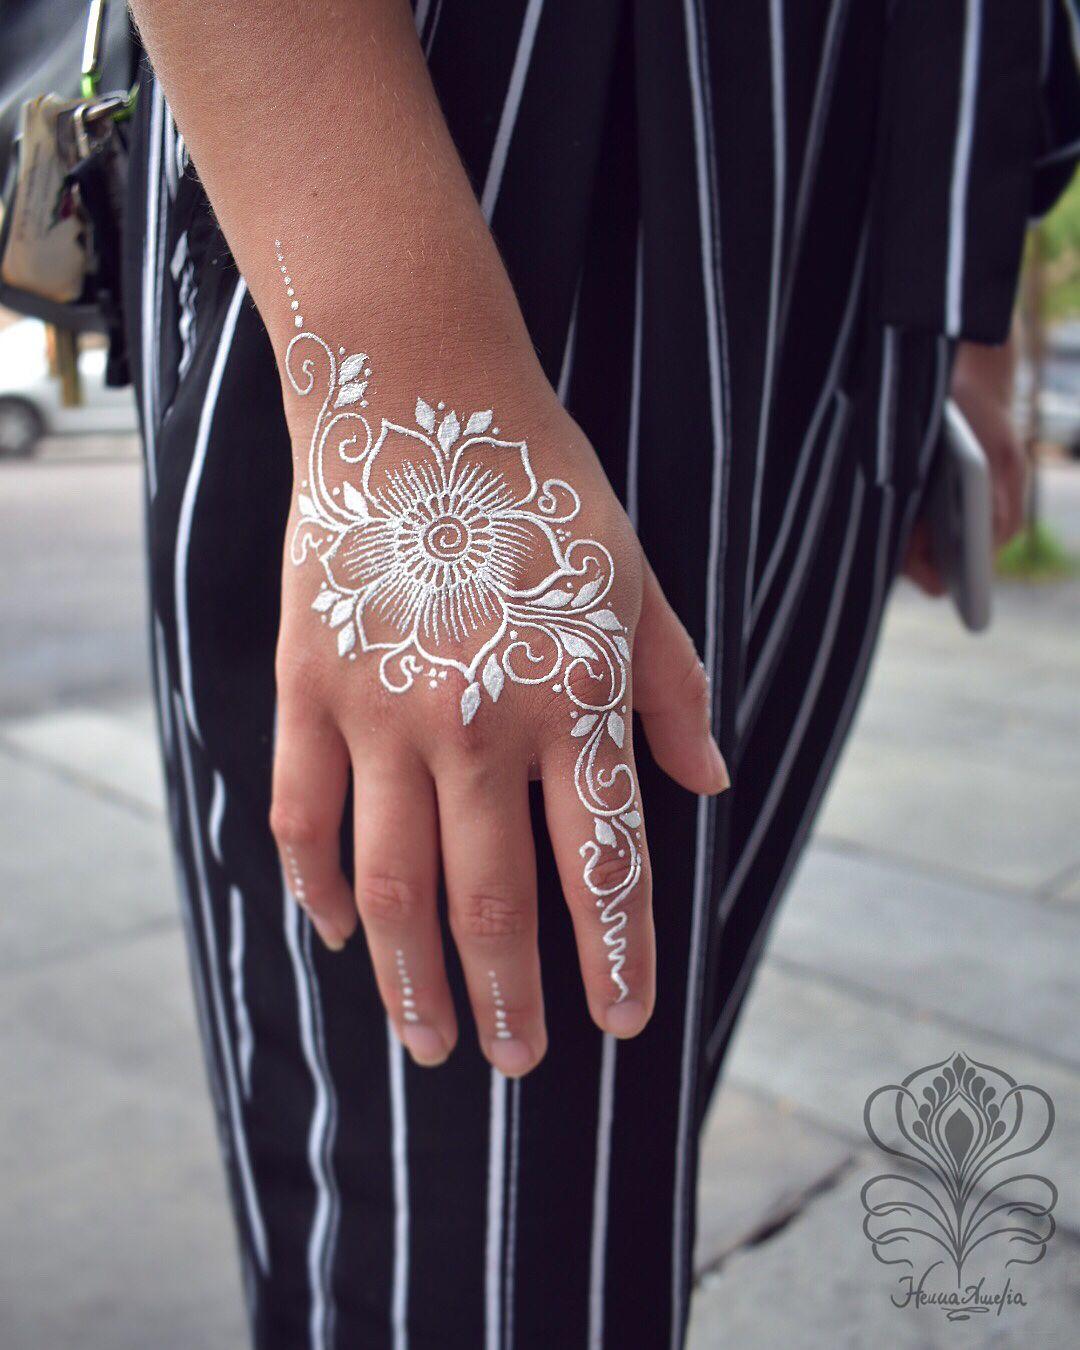 White Waterproof Body Paint Known As White Henna It Has Glitter